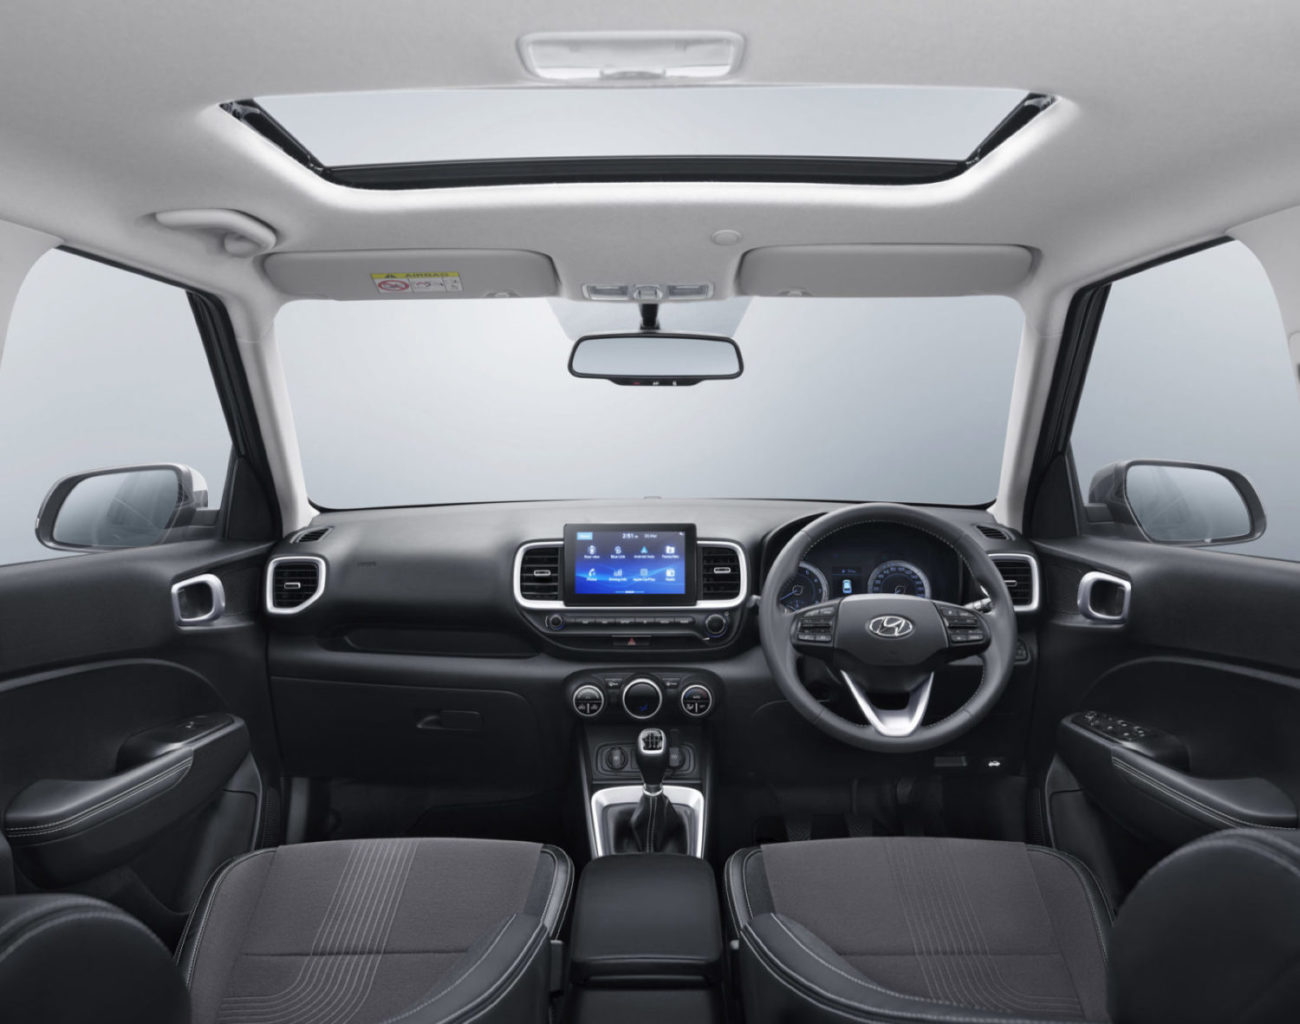 Hyundai Venue Vs Maruti Vitara Brezza Vs Mahindra Xuv300